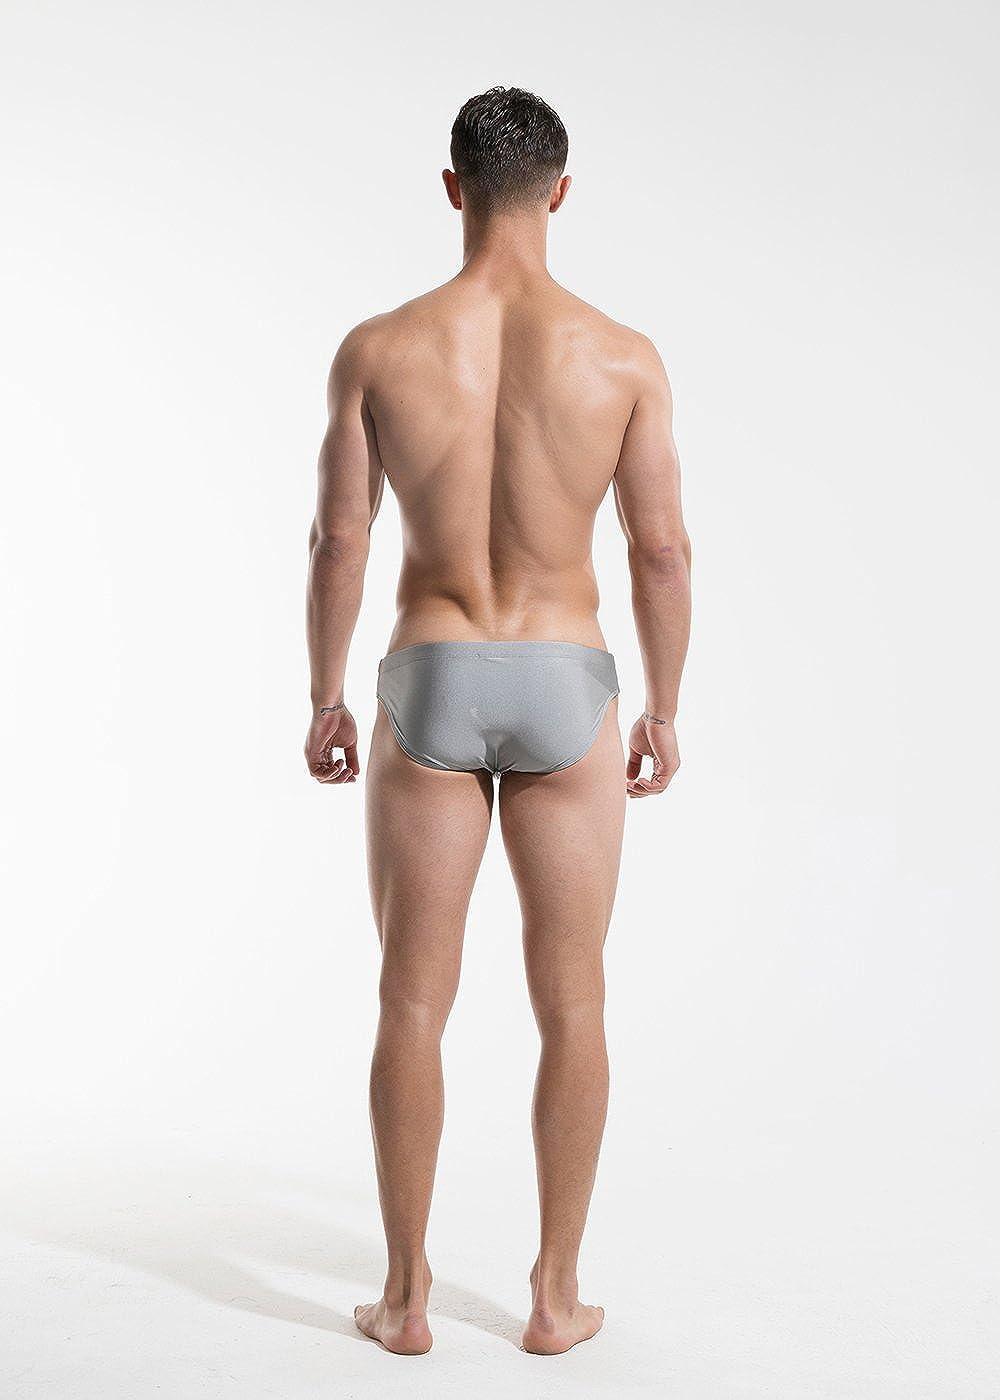 Type 1 4 15 41 125 Lantra Besa Mens Swimming Surfing Underwear Bikini Brief Swimwear Bottom with Drawstring